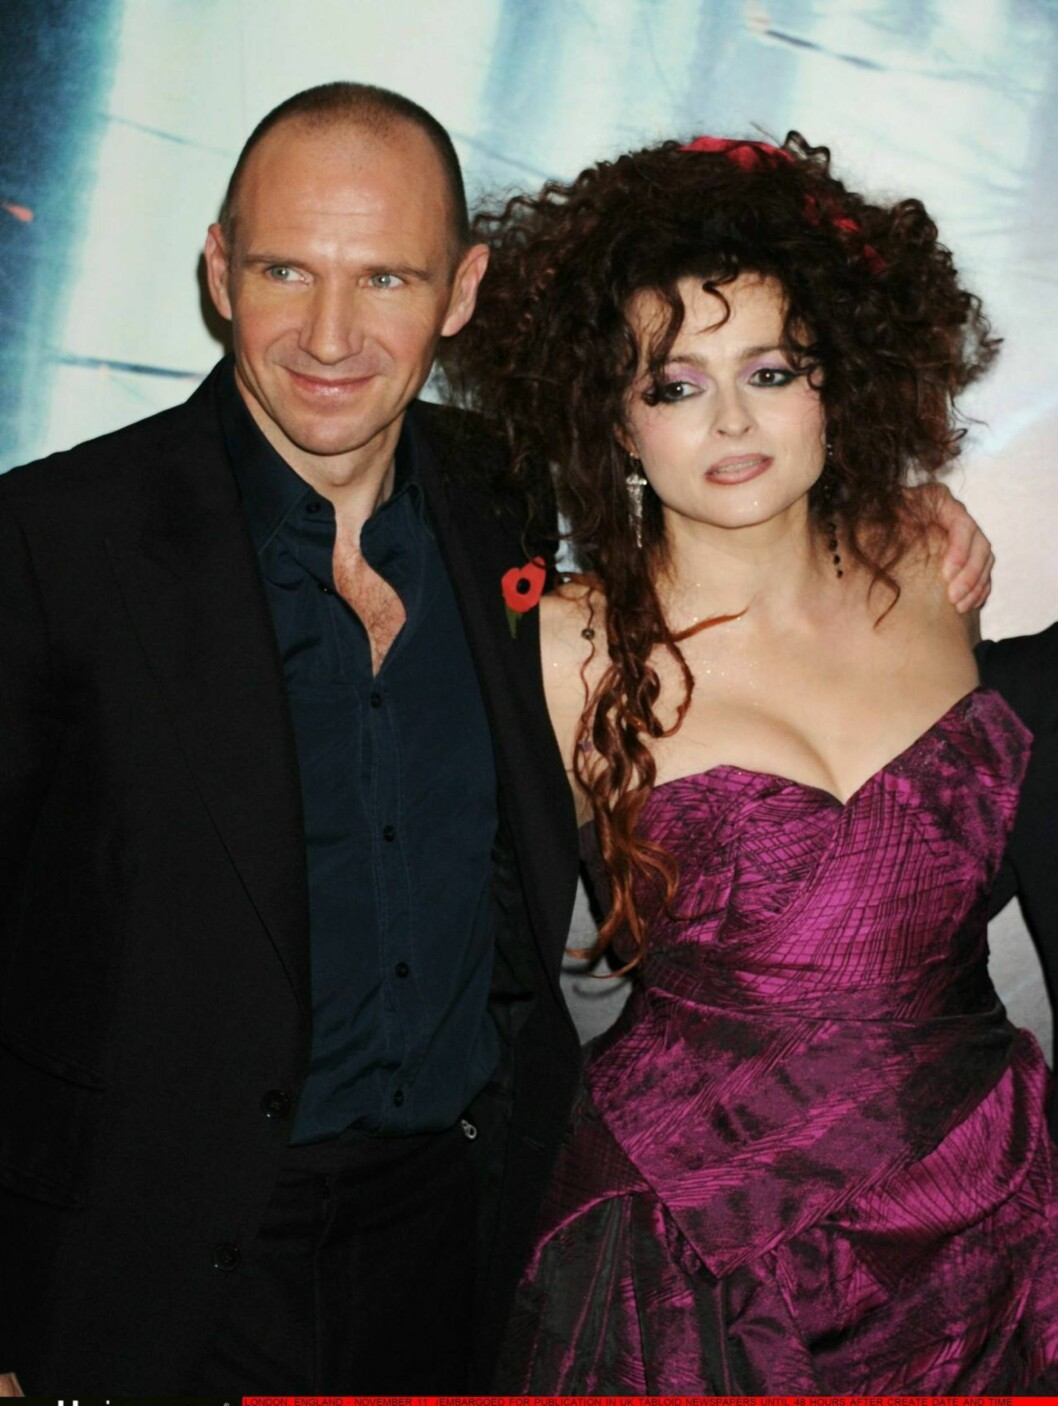 ONDE PLANER?:  Ralph Fiennes og Helena Bonham Carter spiller skurkerollene som Voldemort og Bellatrix Svaart, men hadde bare hyggelige planer torsdag kveld. Foto: All Over Press